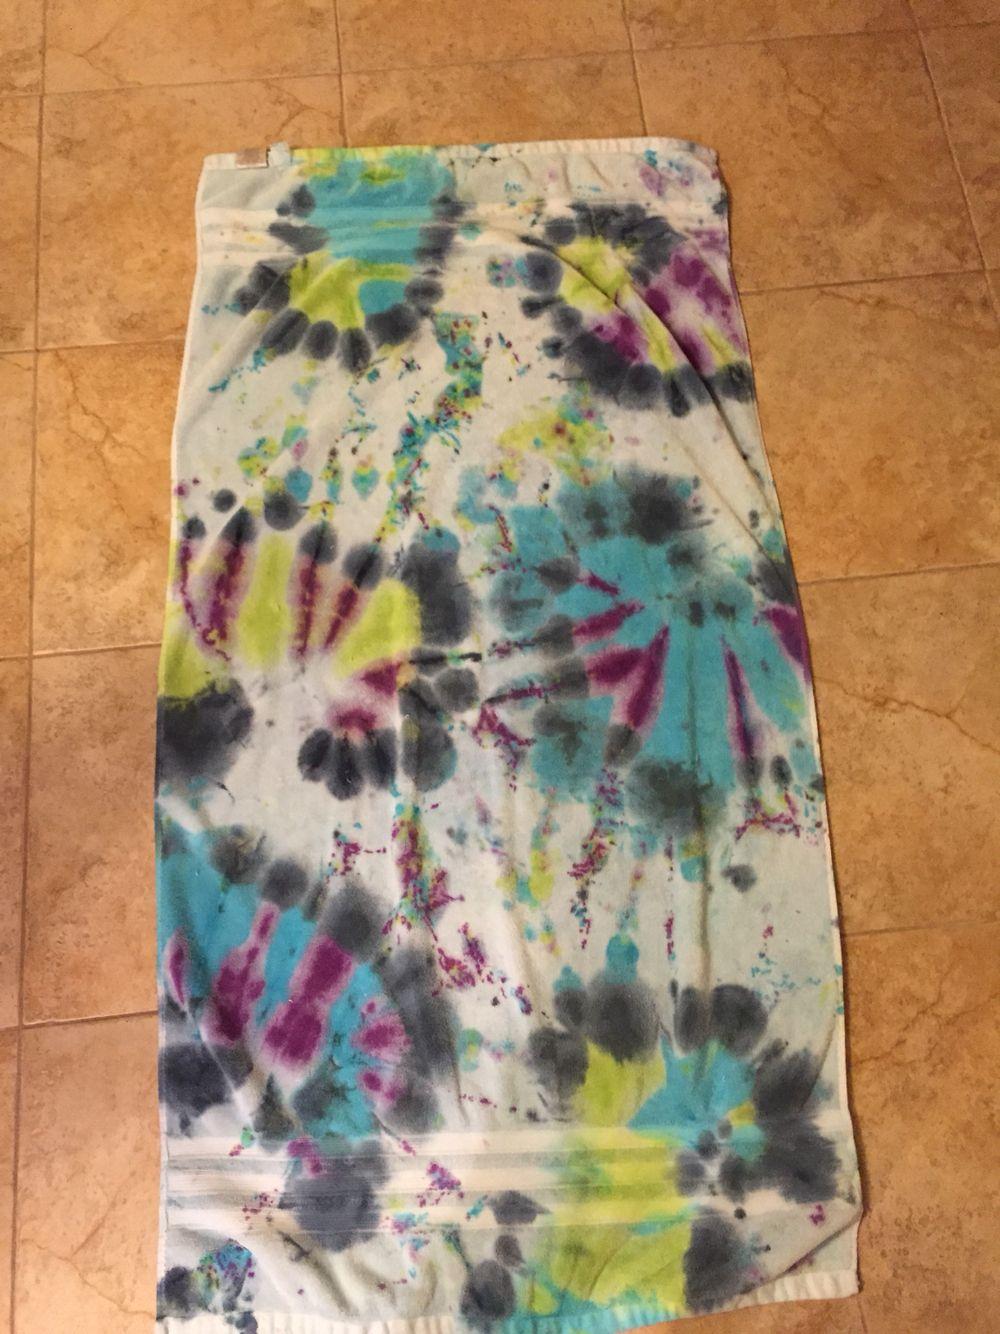 Tye dye towel I made